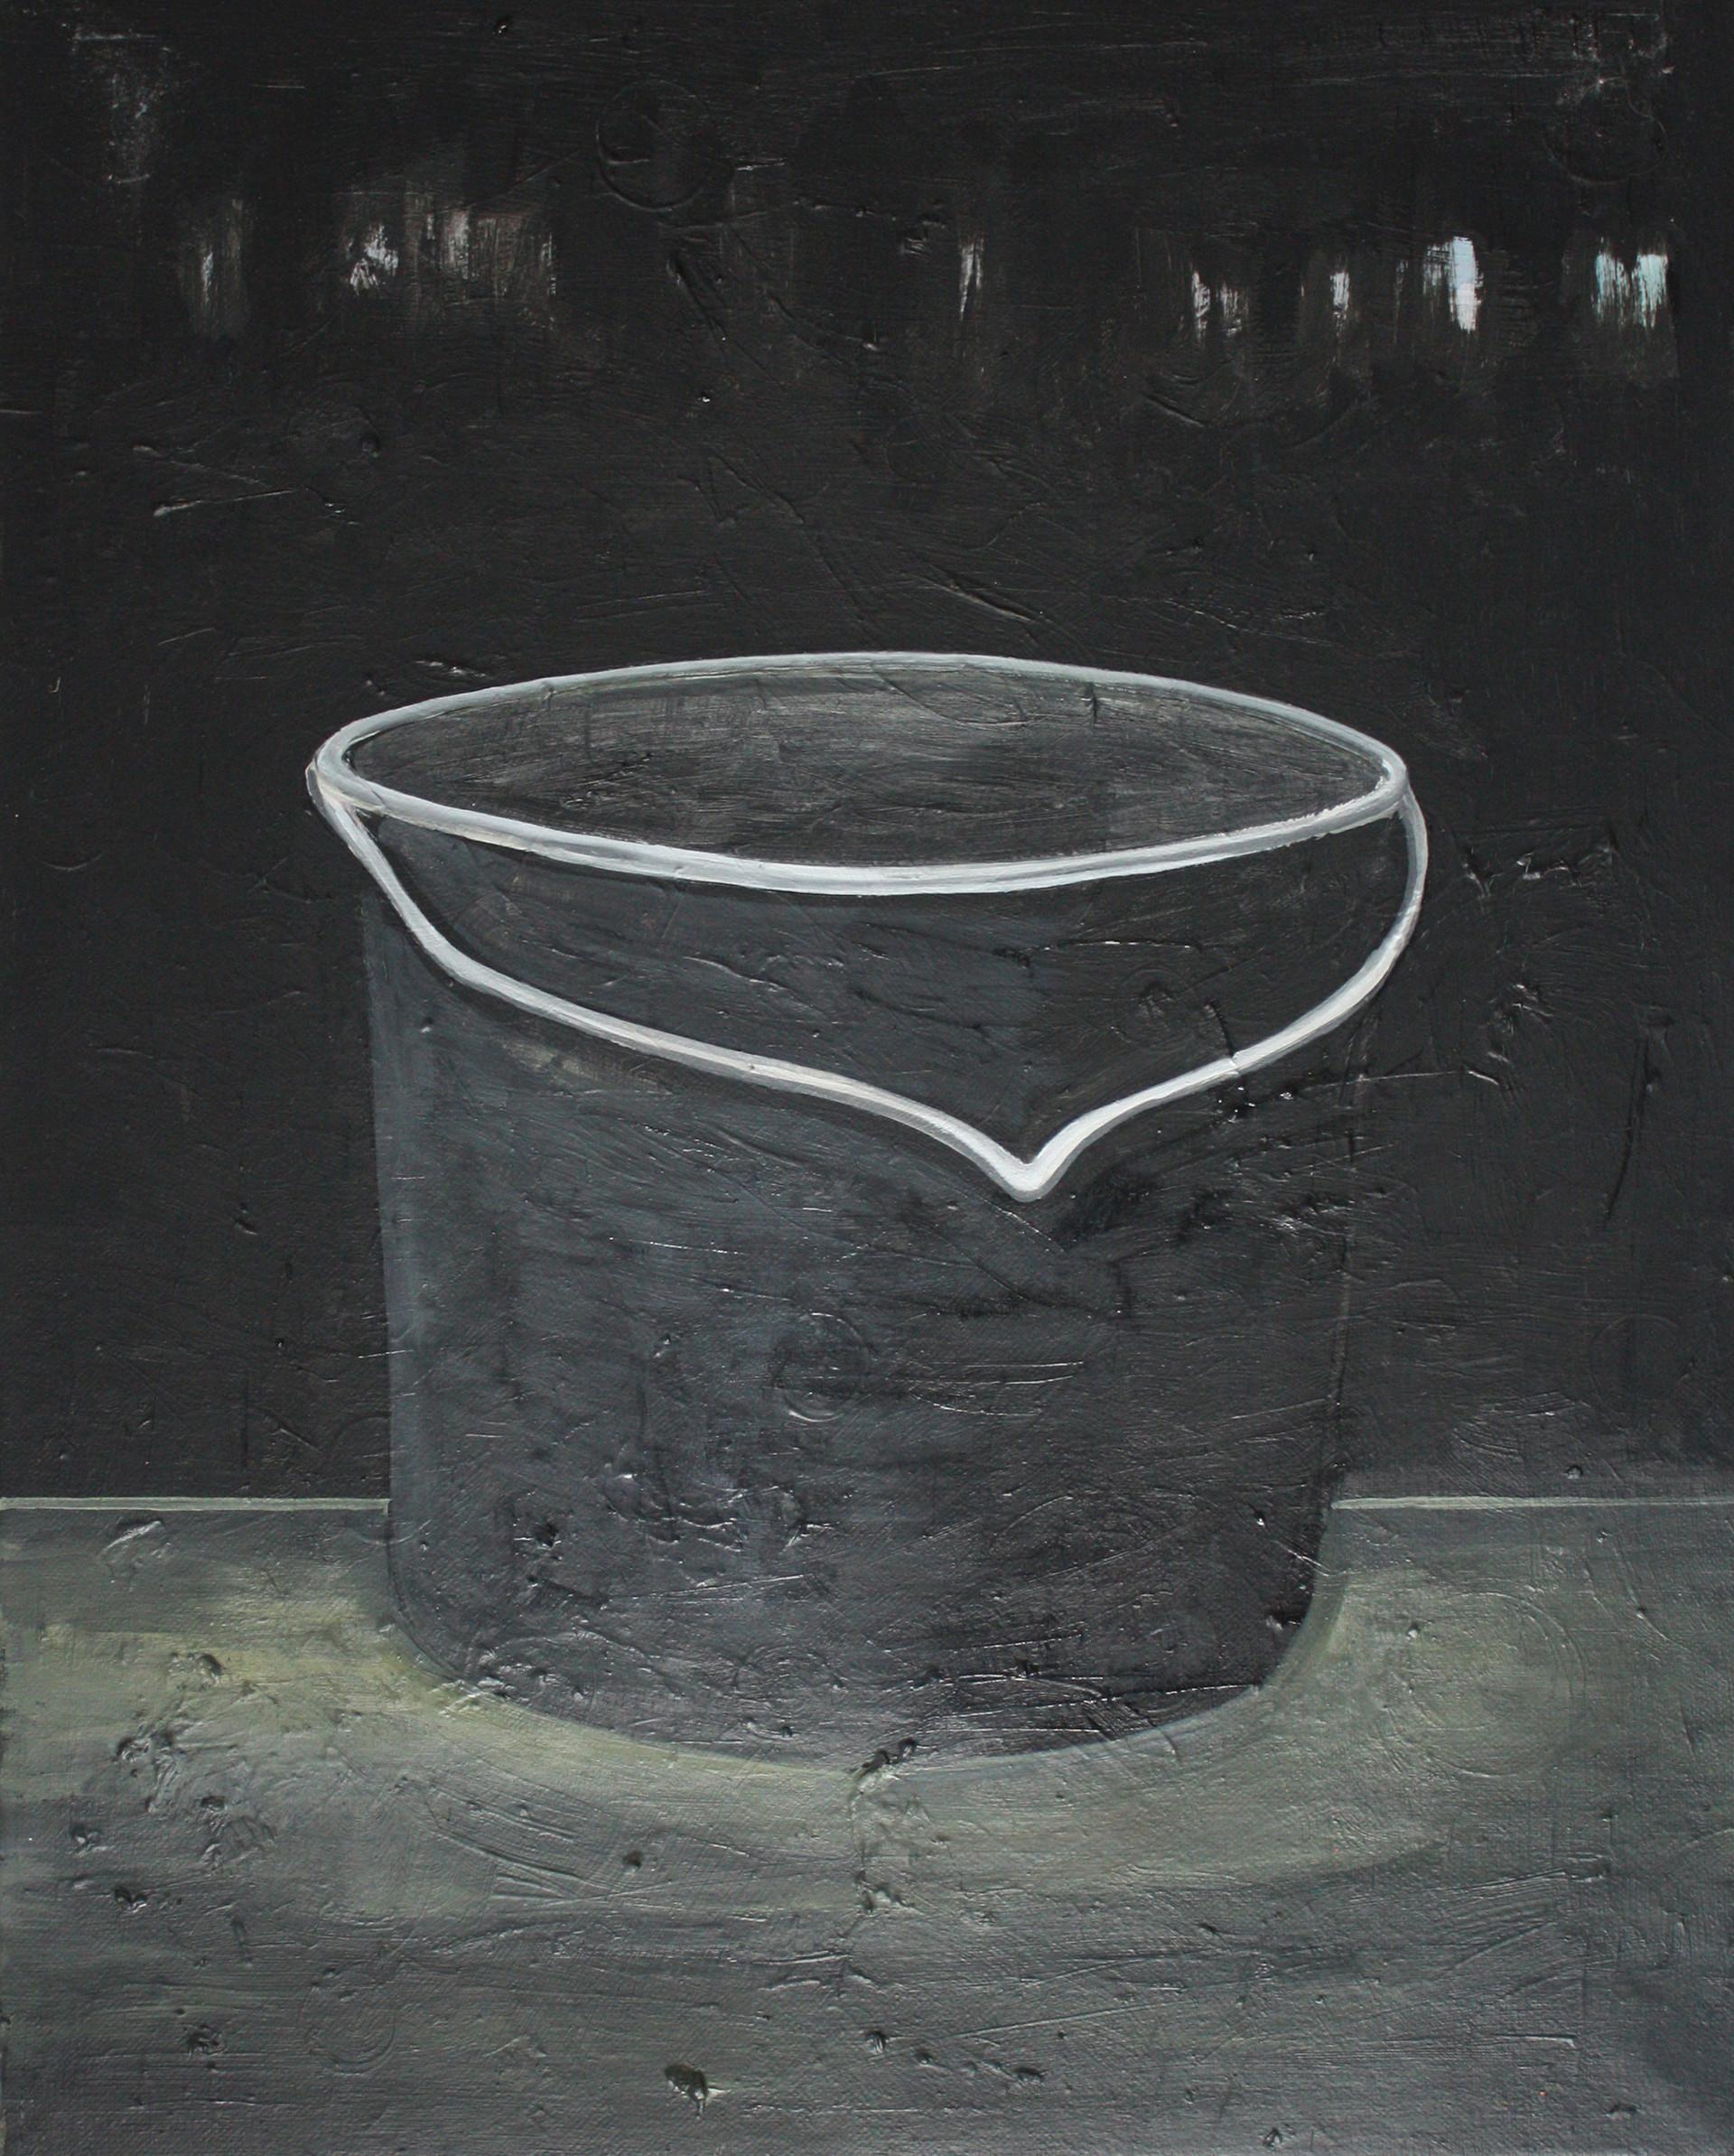 black one - 2010 - öl auf leinwand - 50 x 40 cm